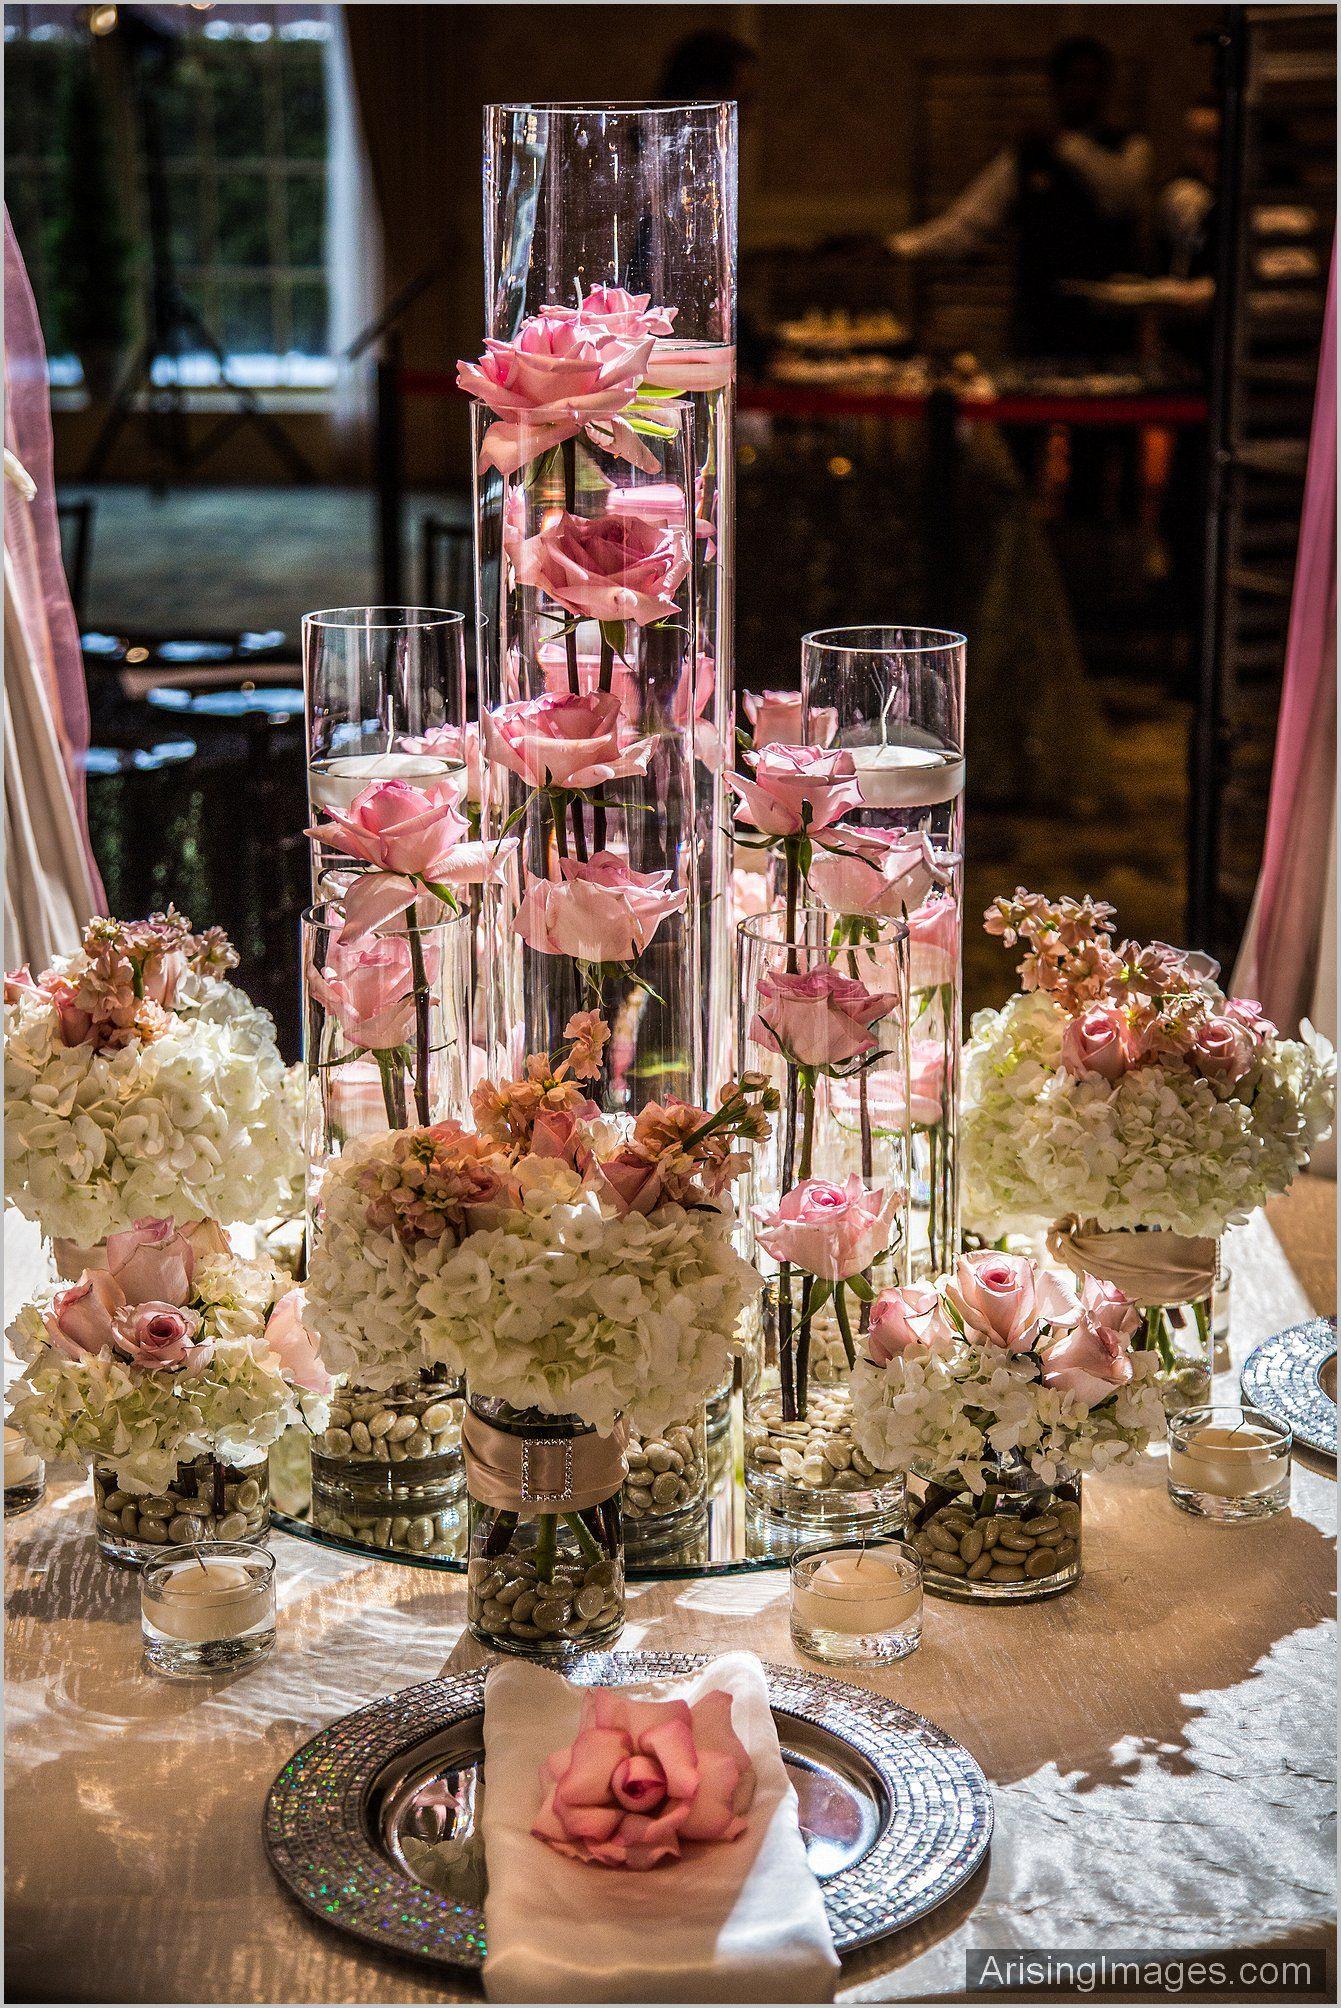 Ballroom Bliss At Royal Park Hotel Unique Wedding Centerpieces Wedding Centerpieces Wedding Dessert Table